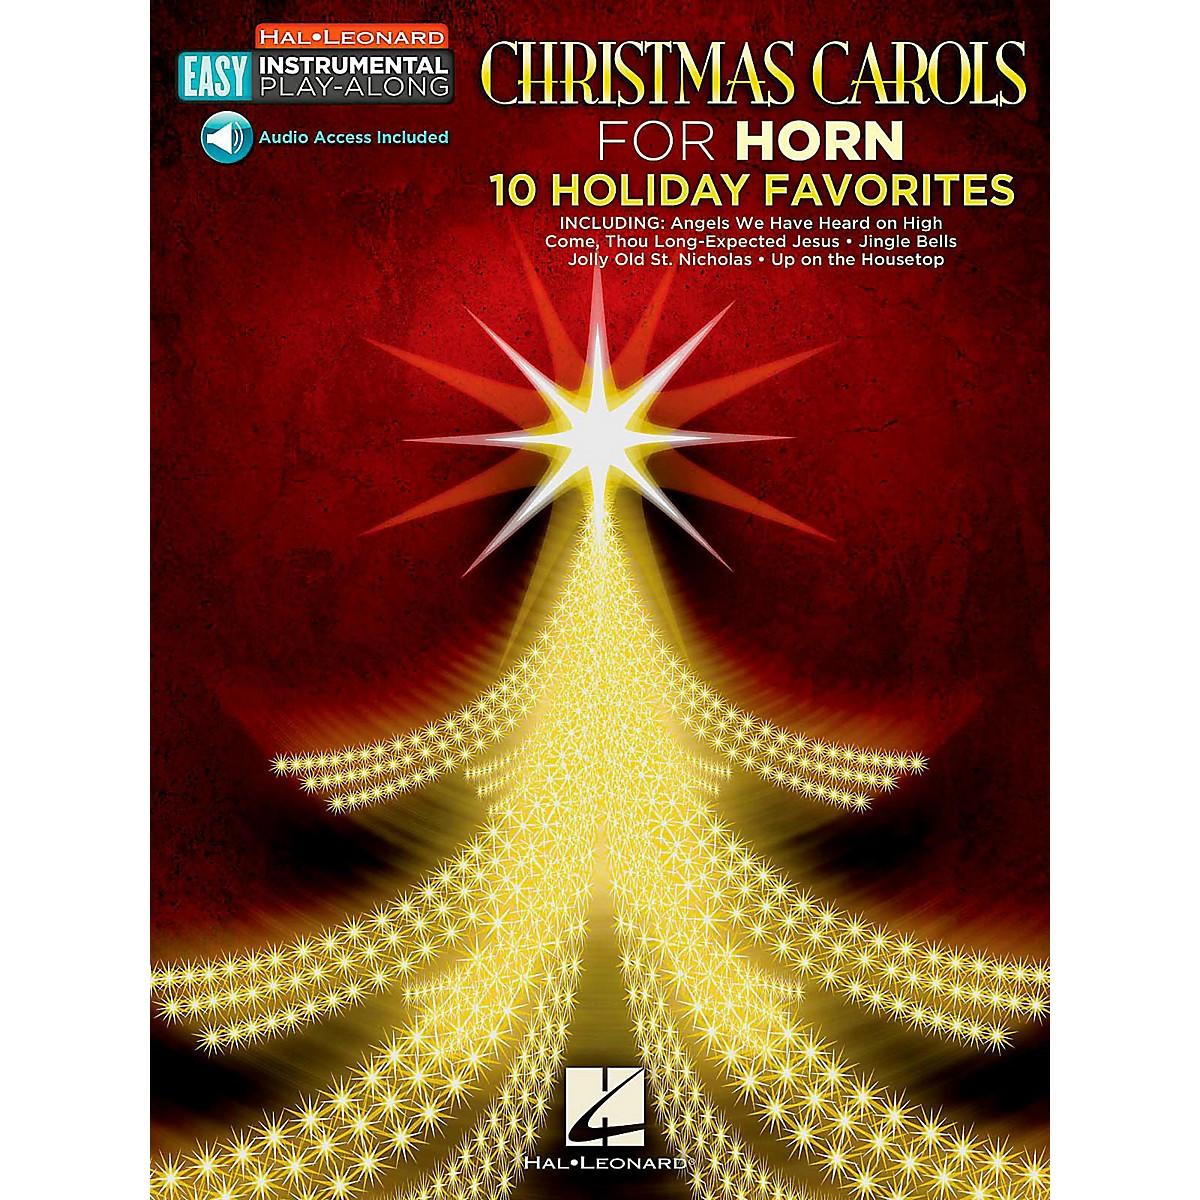 Hal Leonard Christmas Carols - Horn - Easy Instrumental Play-Along (Audio Online)